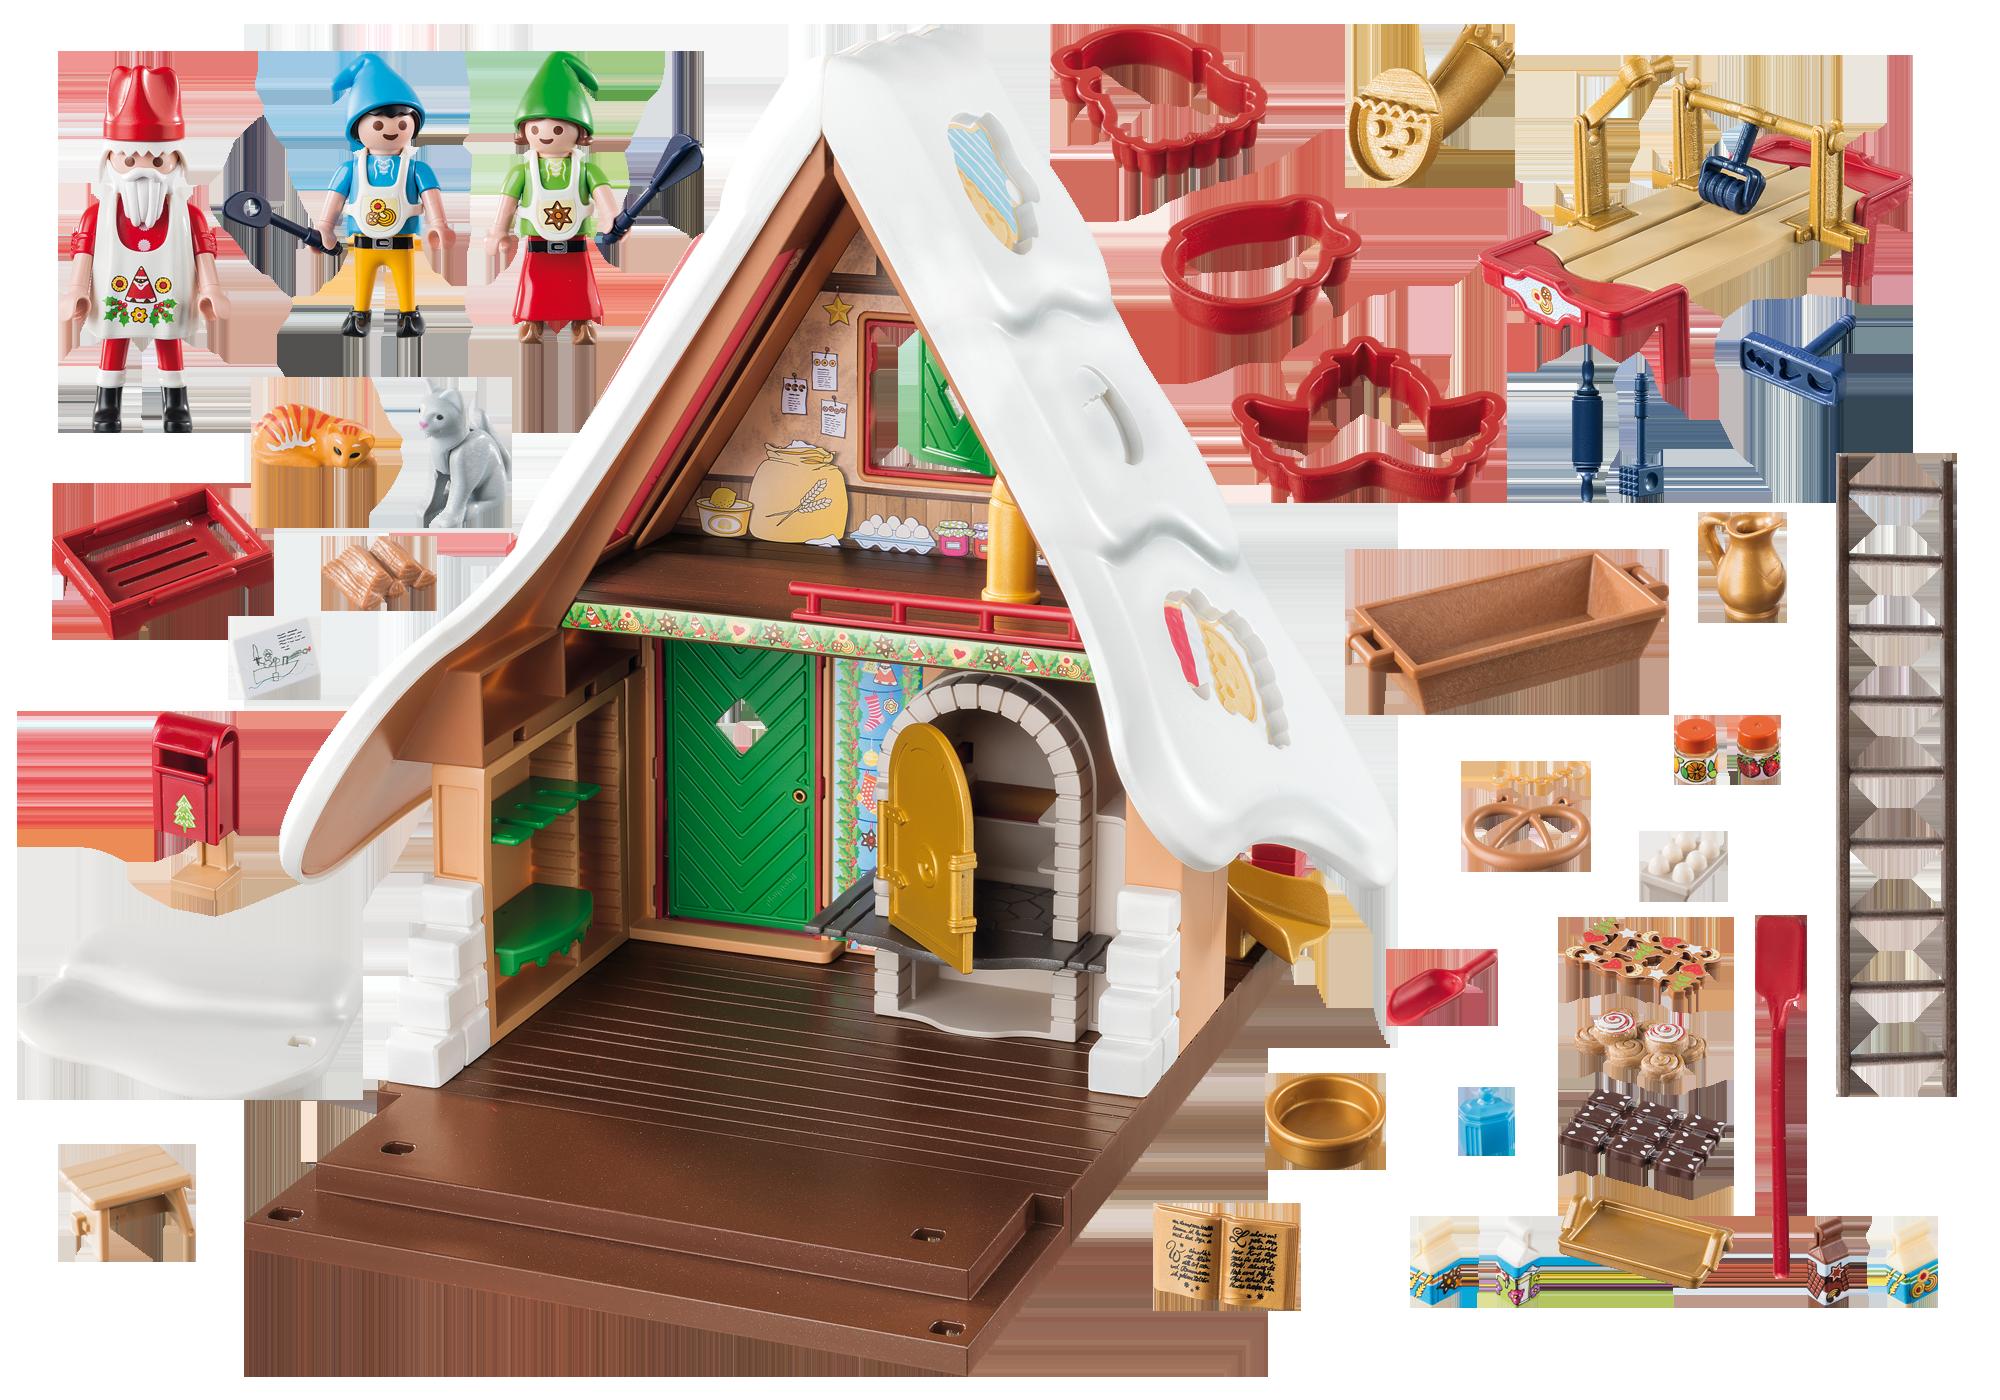 http://media.playmobil.com/i/playmobil/9493_product_box_back/Julebageri med småkageskærere